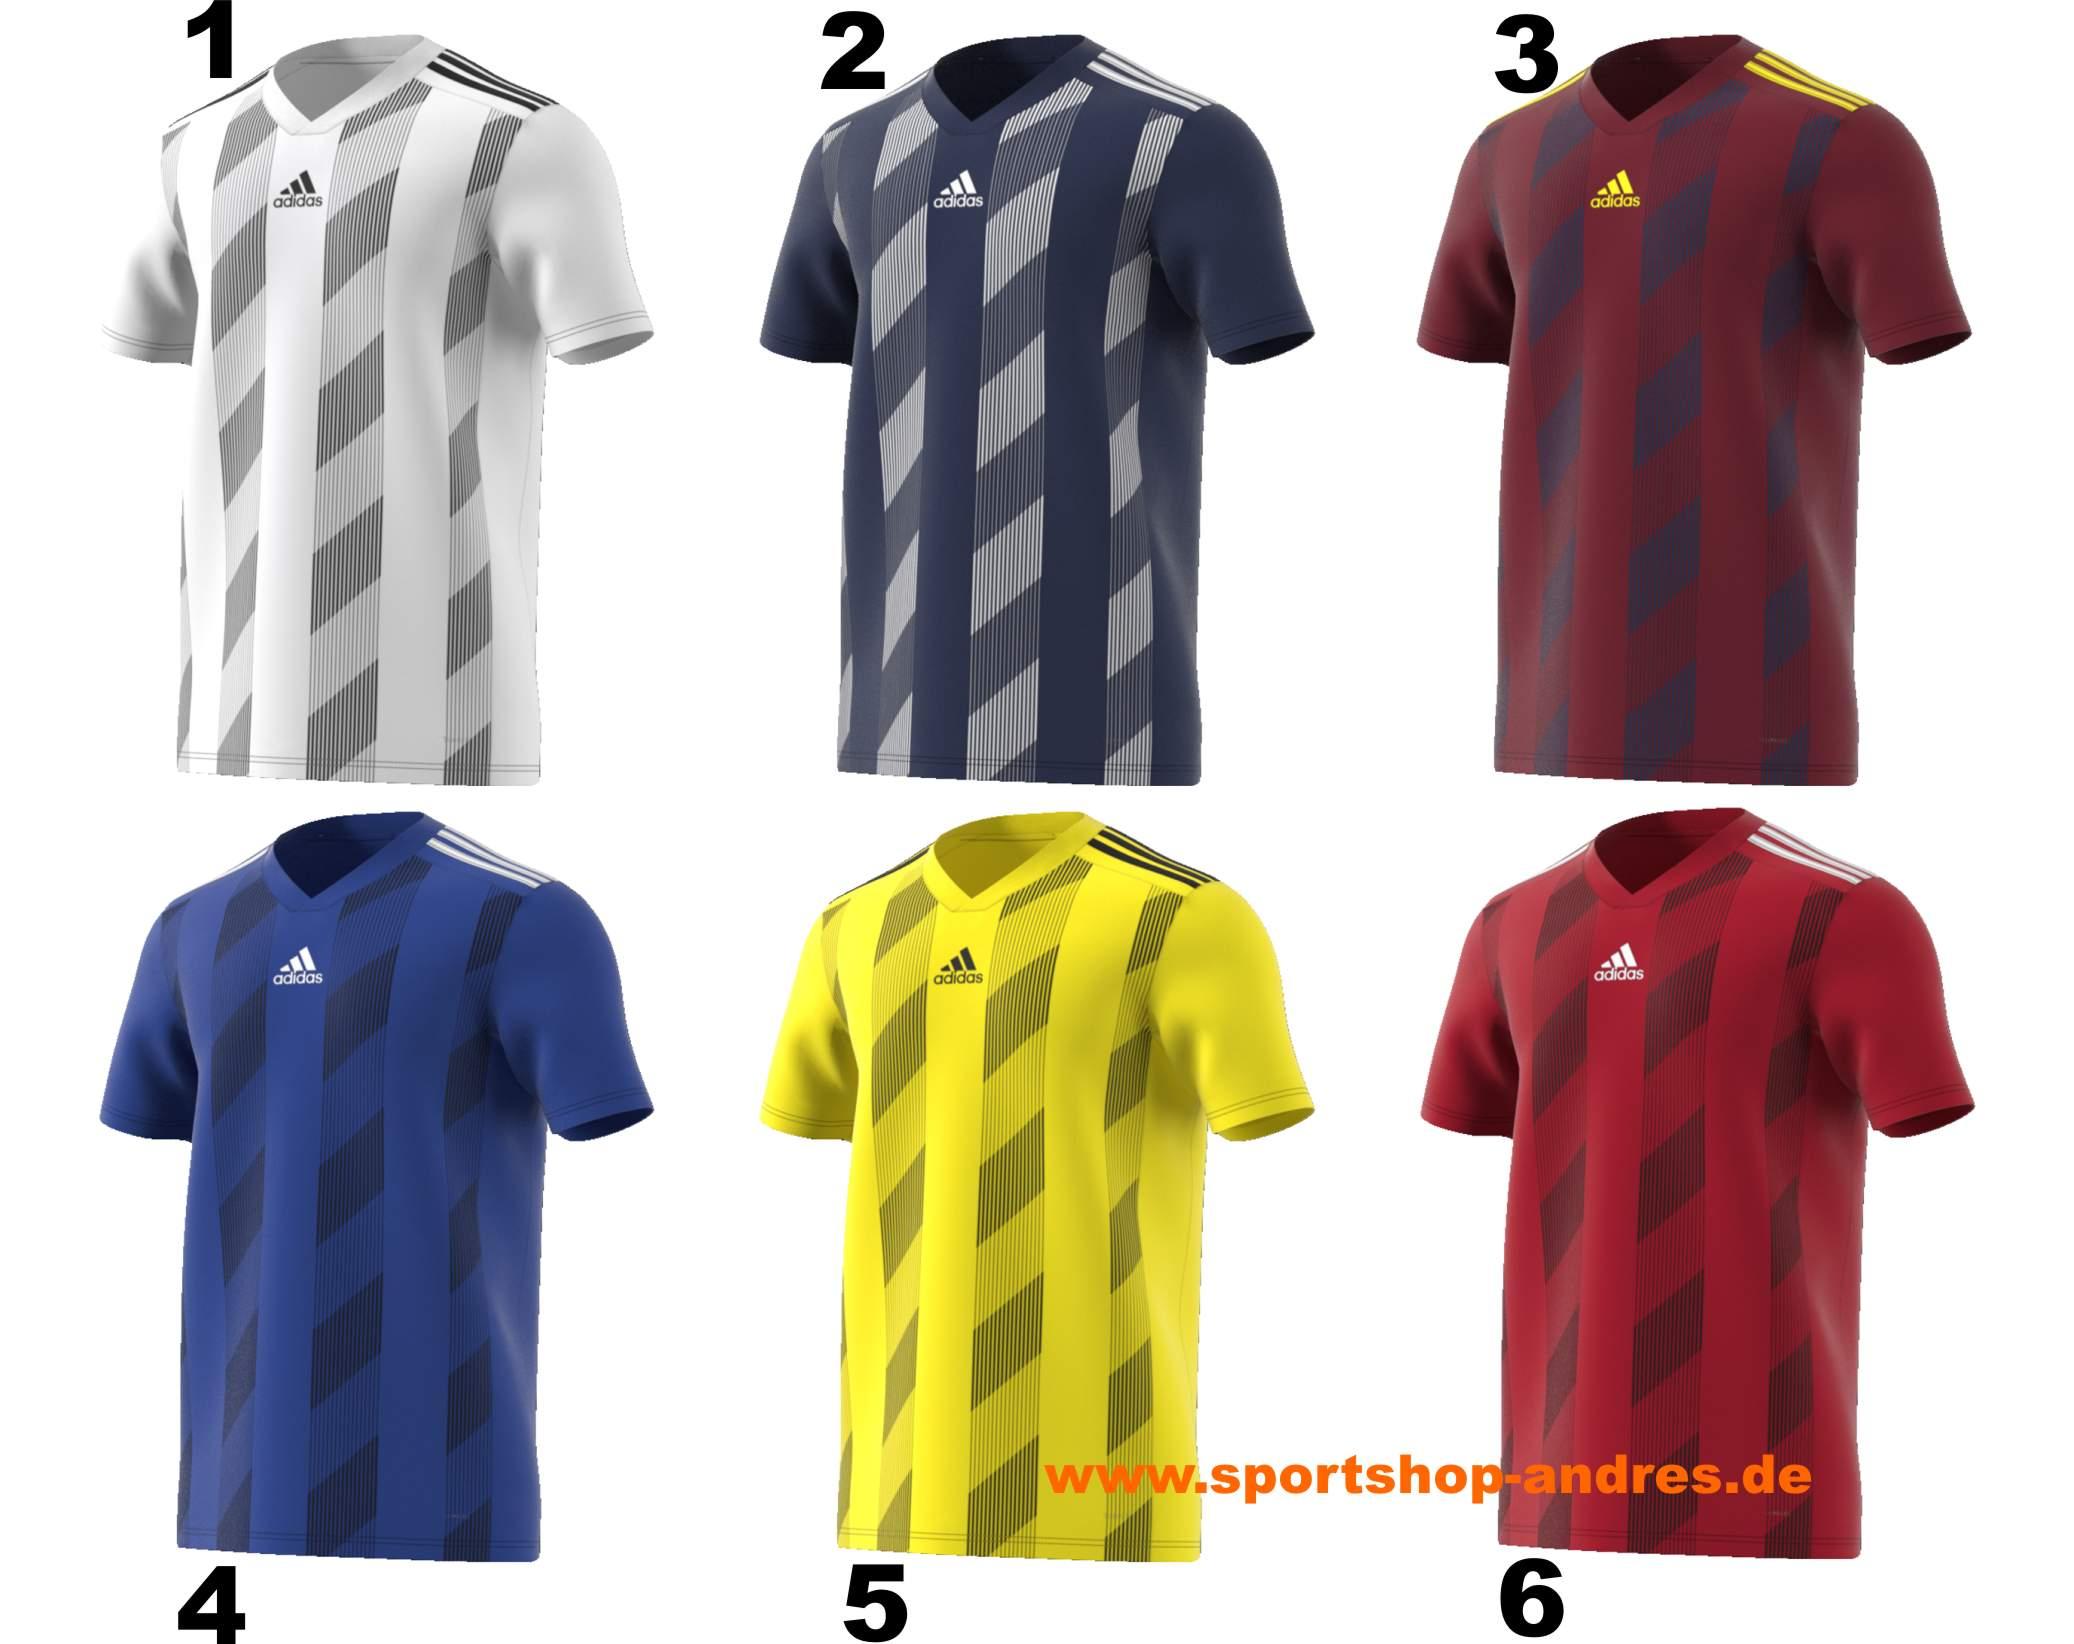 Sportshop Andres Adidas Fussballtrikot Striped 19 nur 14